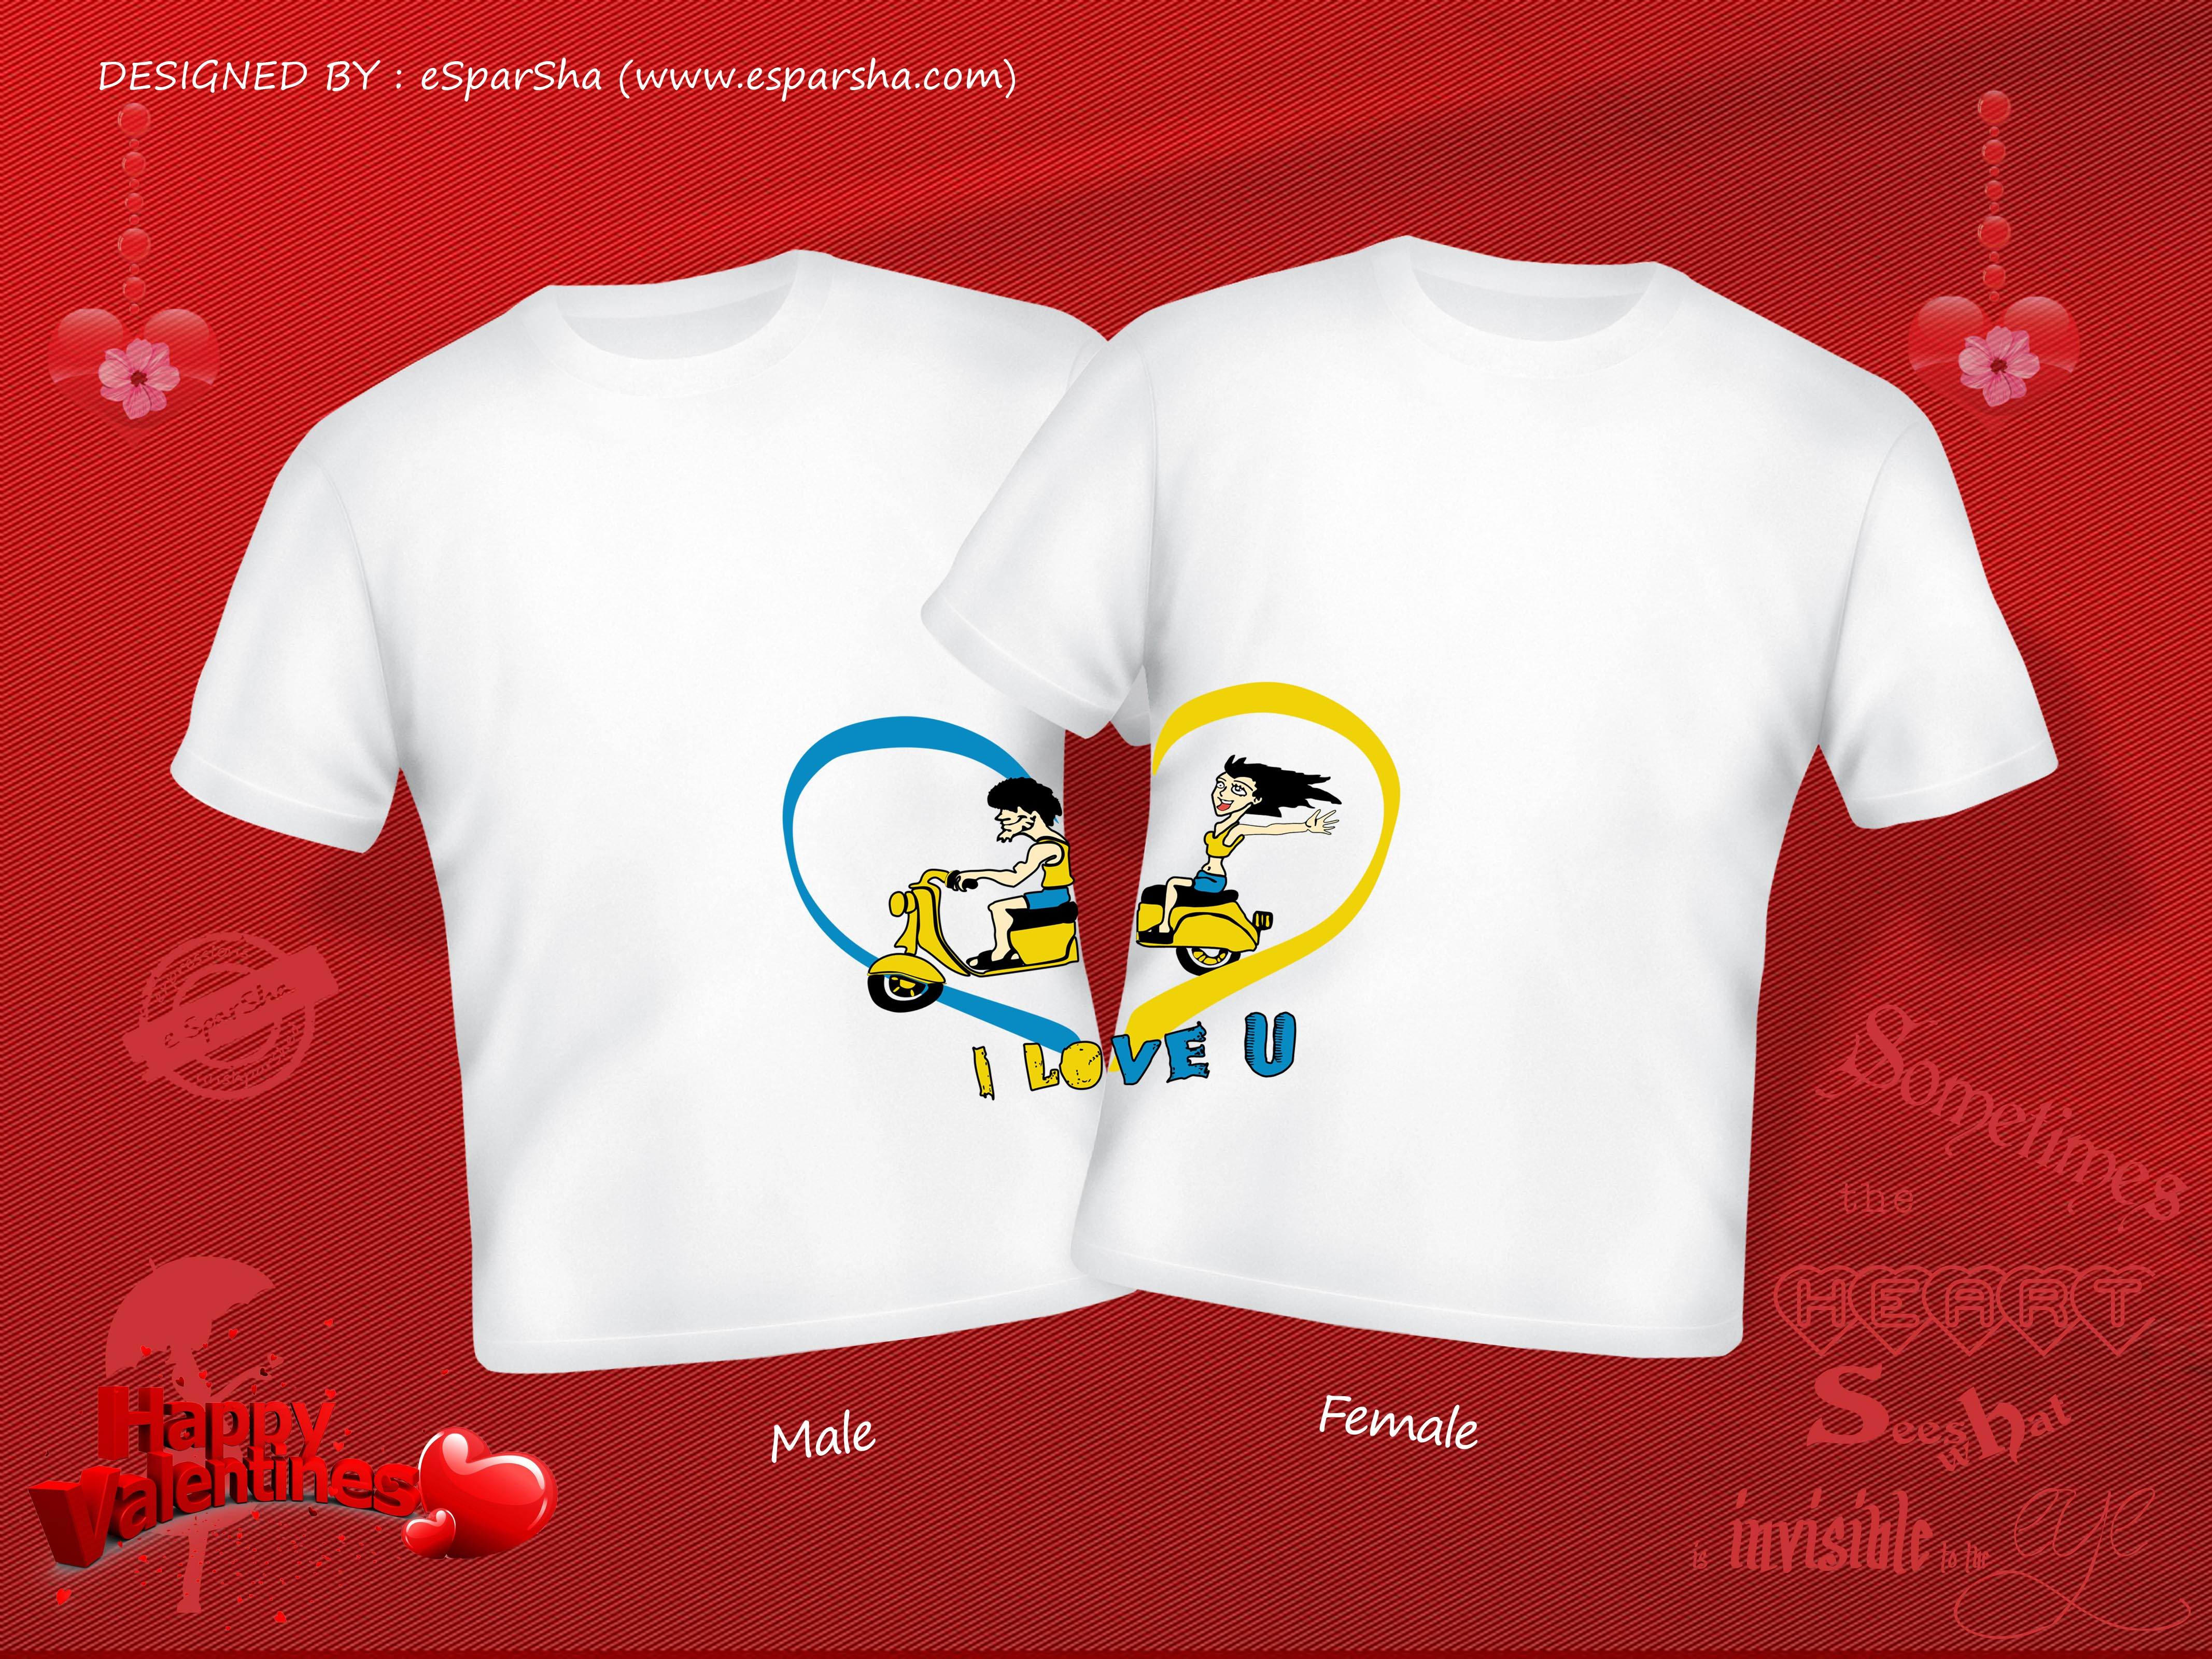 Couple shirt design quotes - Couple Shirt Design Quotes 56